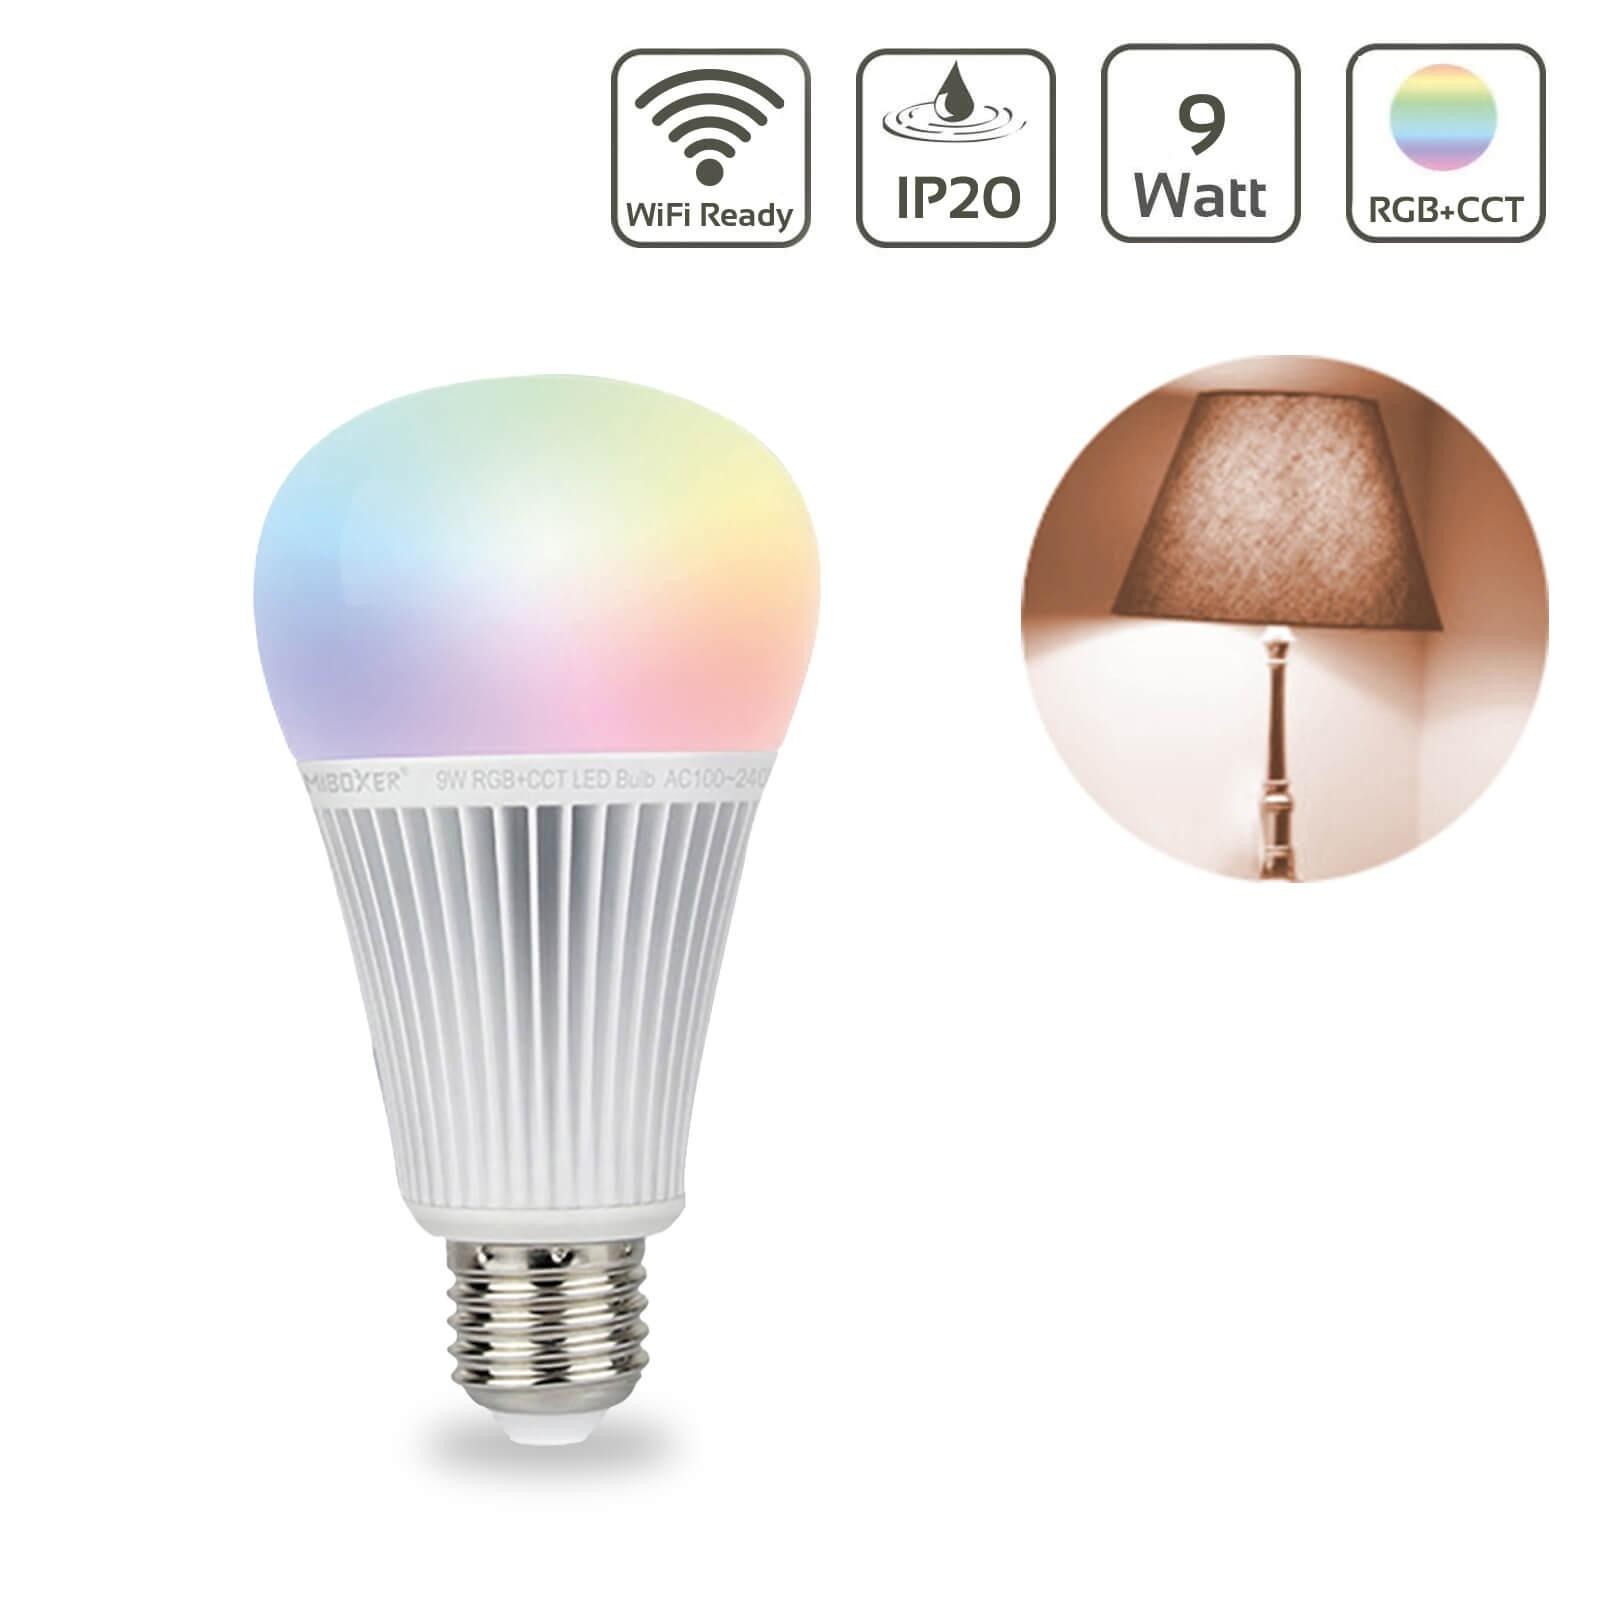 MiBoxer RGB+CCT Lampe 9W E27 | 2.4GHz WiFi ready | FUT012